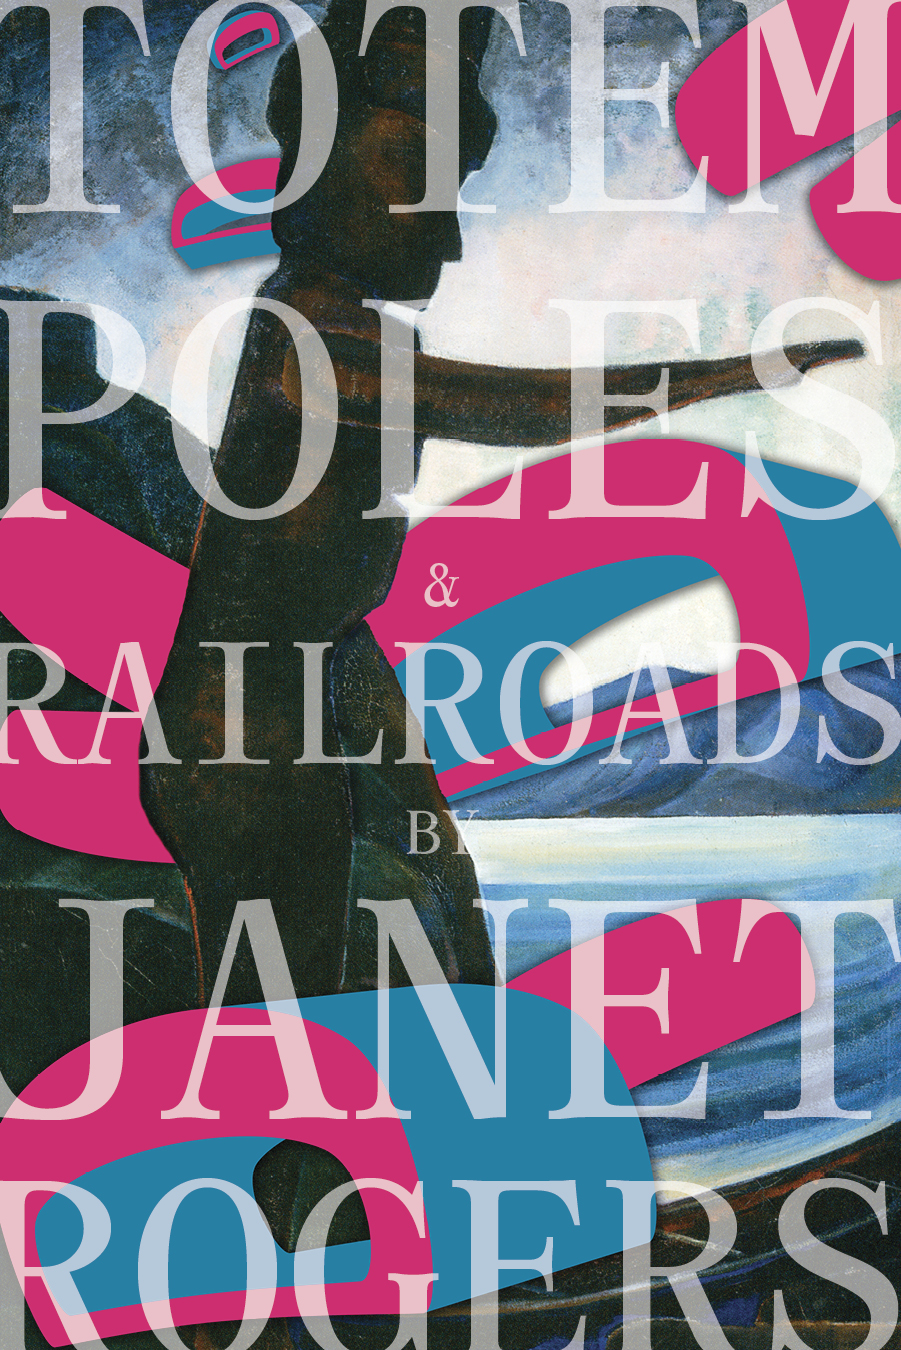 Totem Poles and Railroads